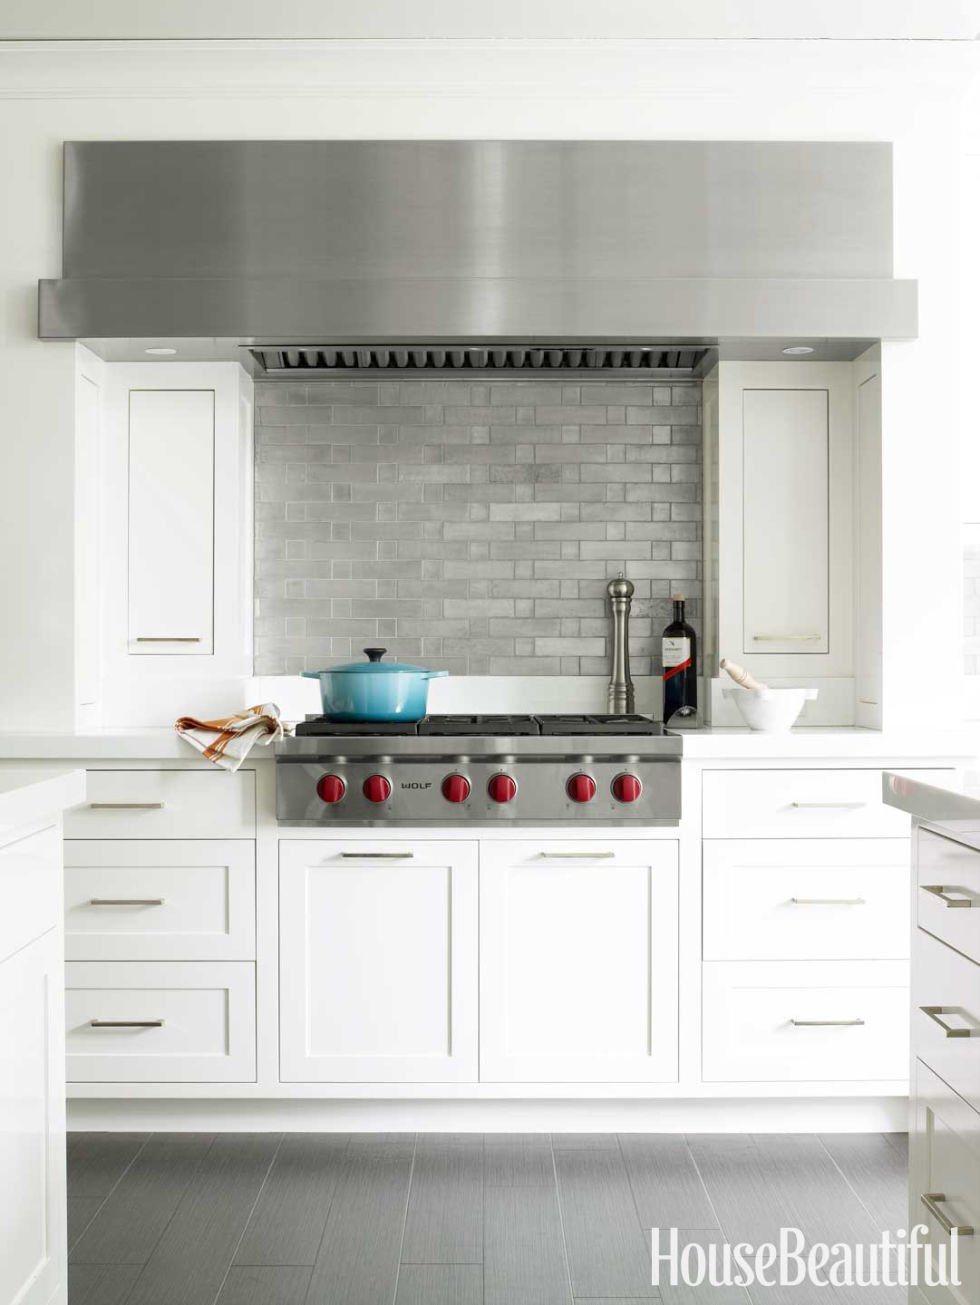 backsplash ideas tile designs kitchen backsplash small small tile backsplash kitchen home design ideas